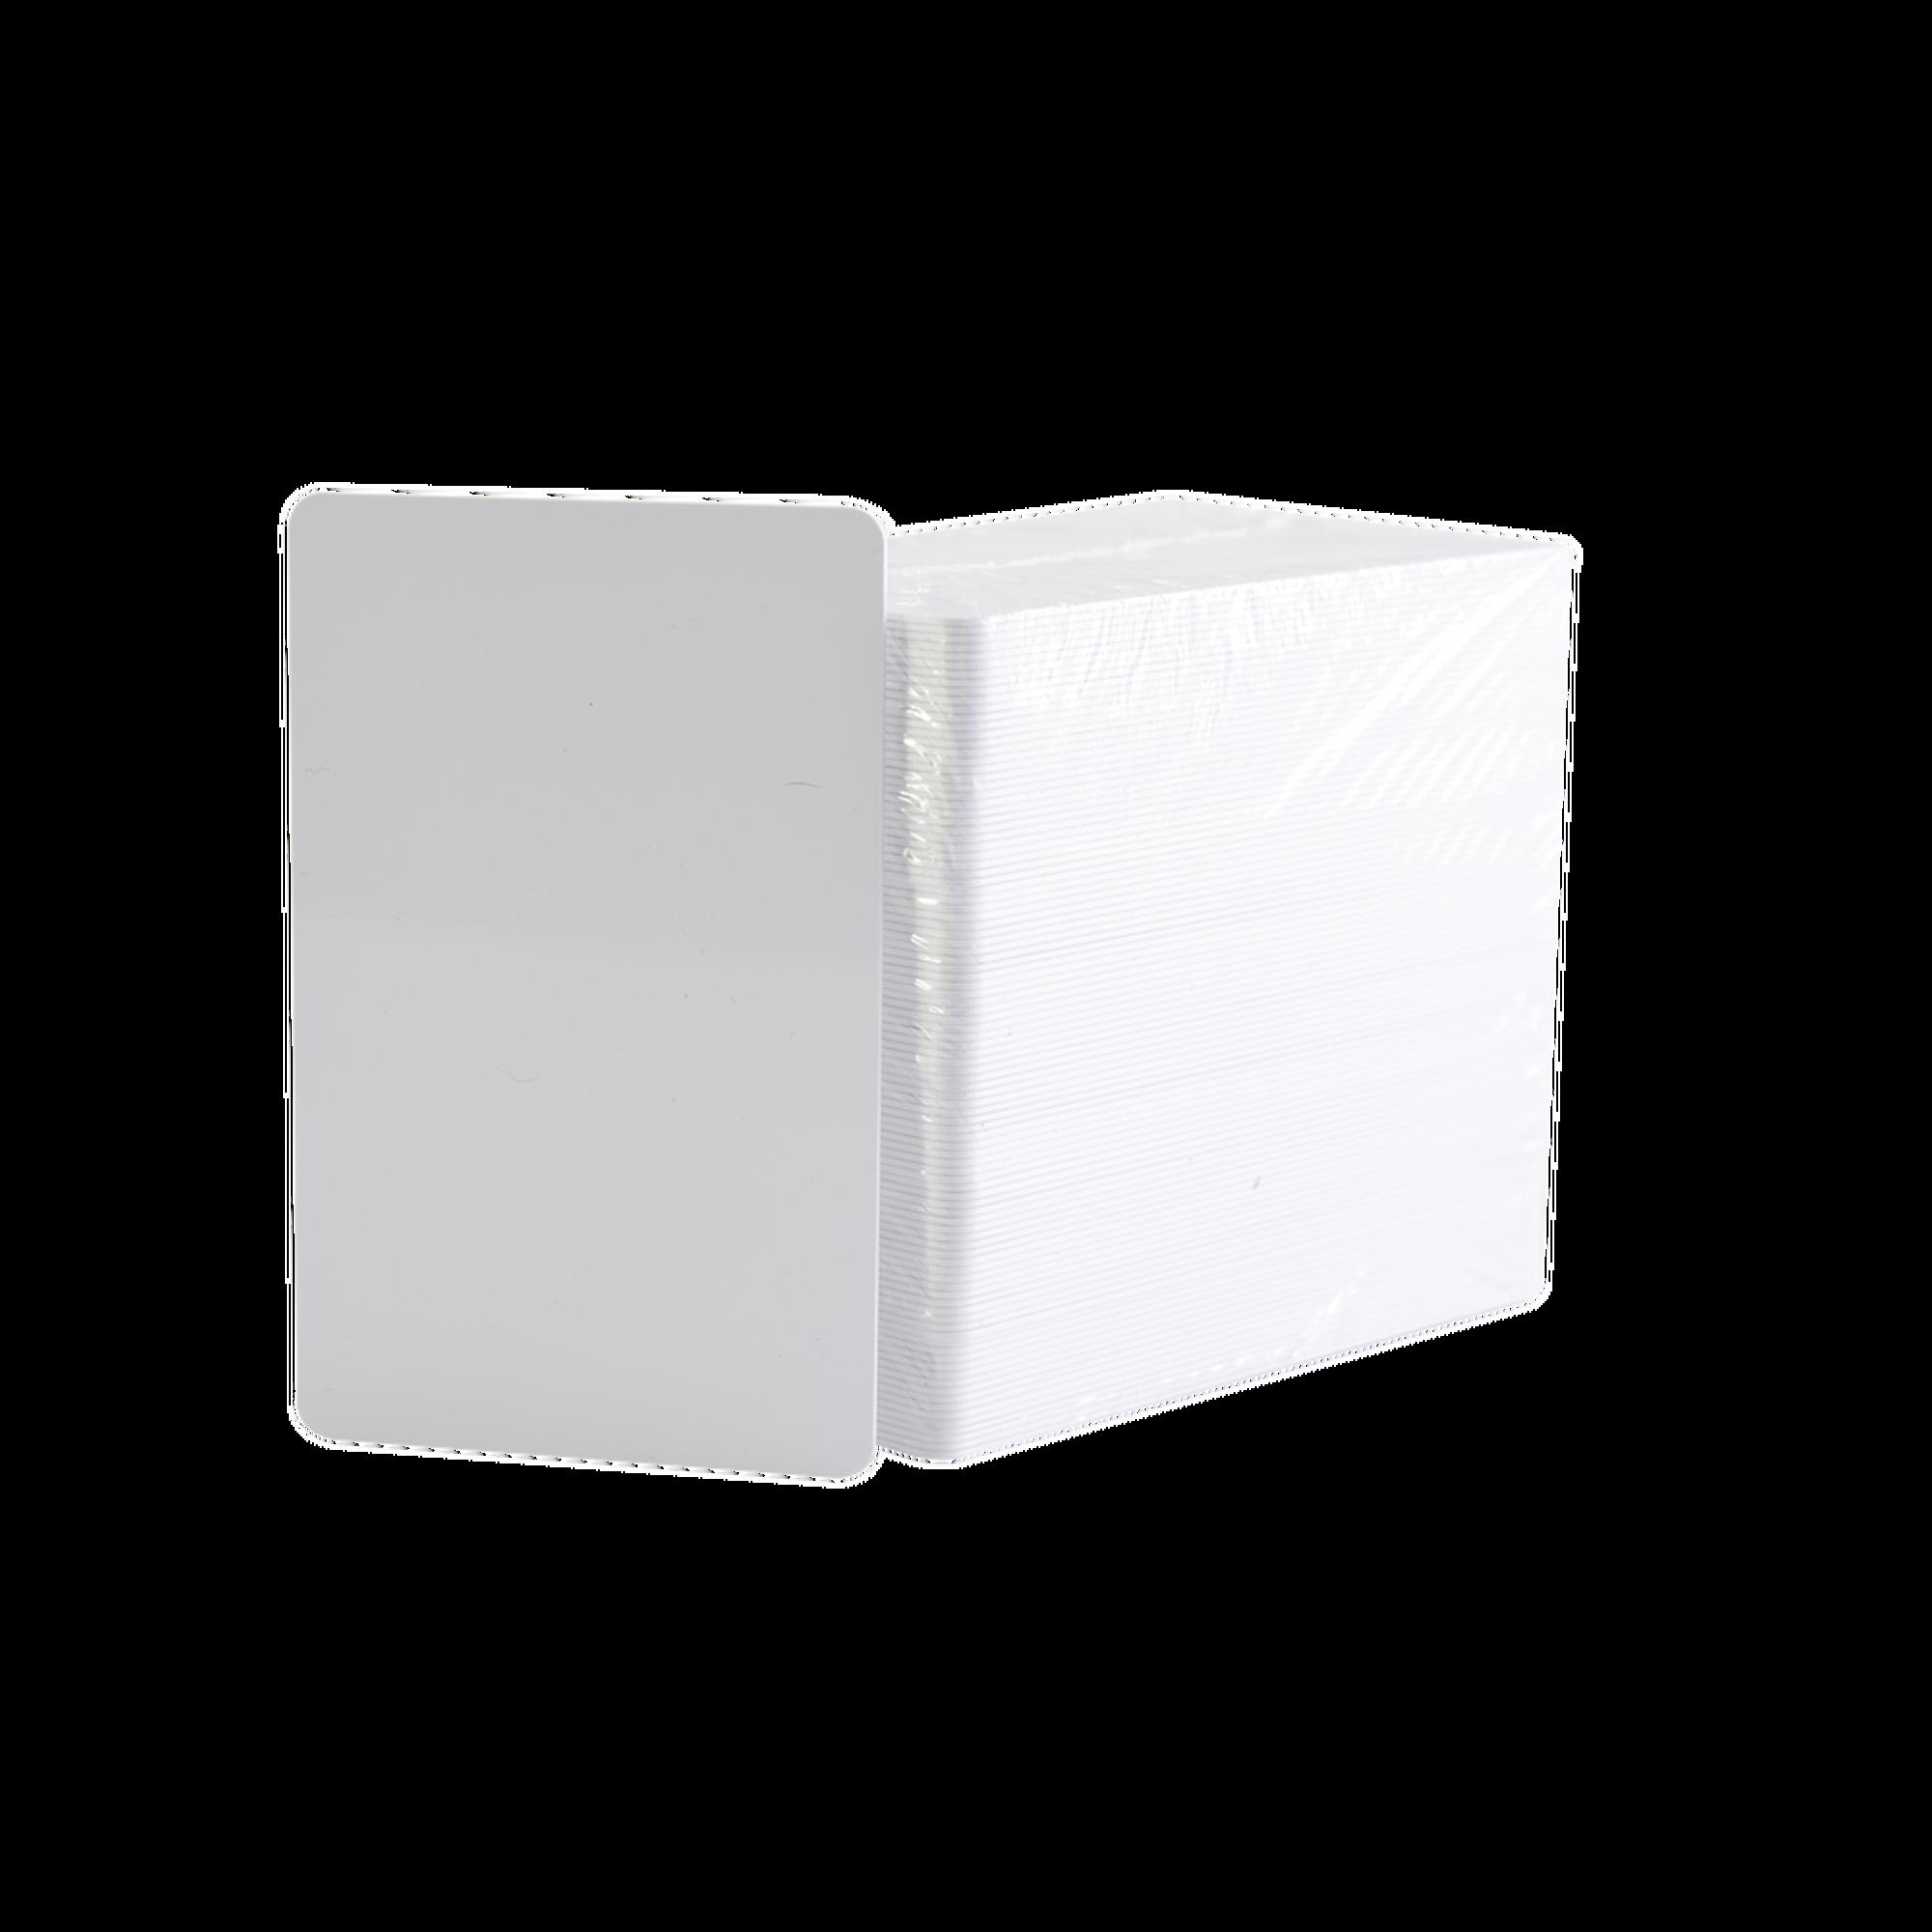 Paquete de 500 tarjetas de PVC UltraCard 30 mil CR80/ Diseñadas para impresion/ Sin Tecnologia